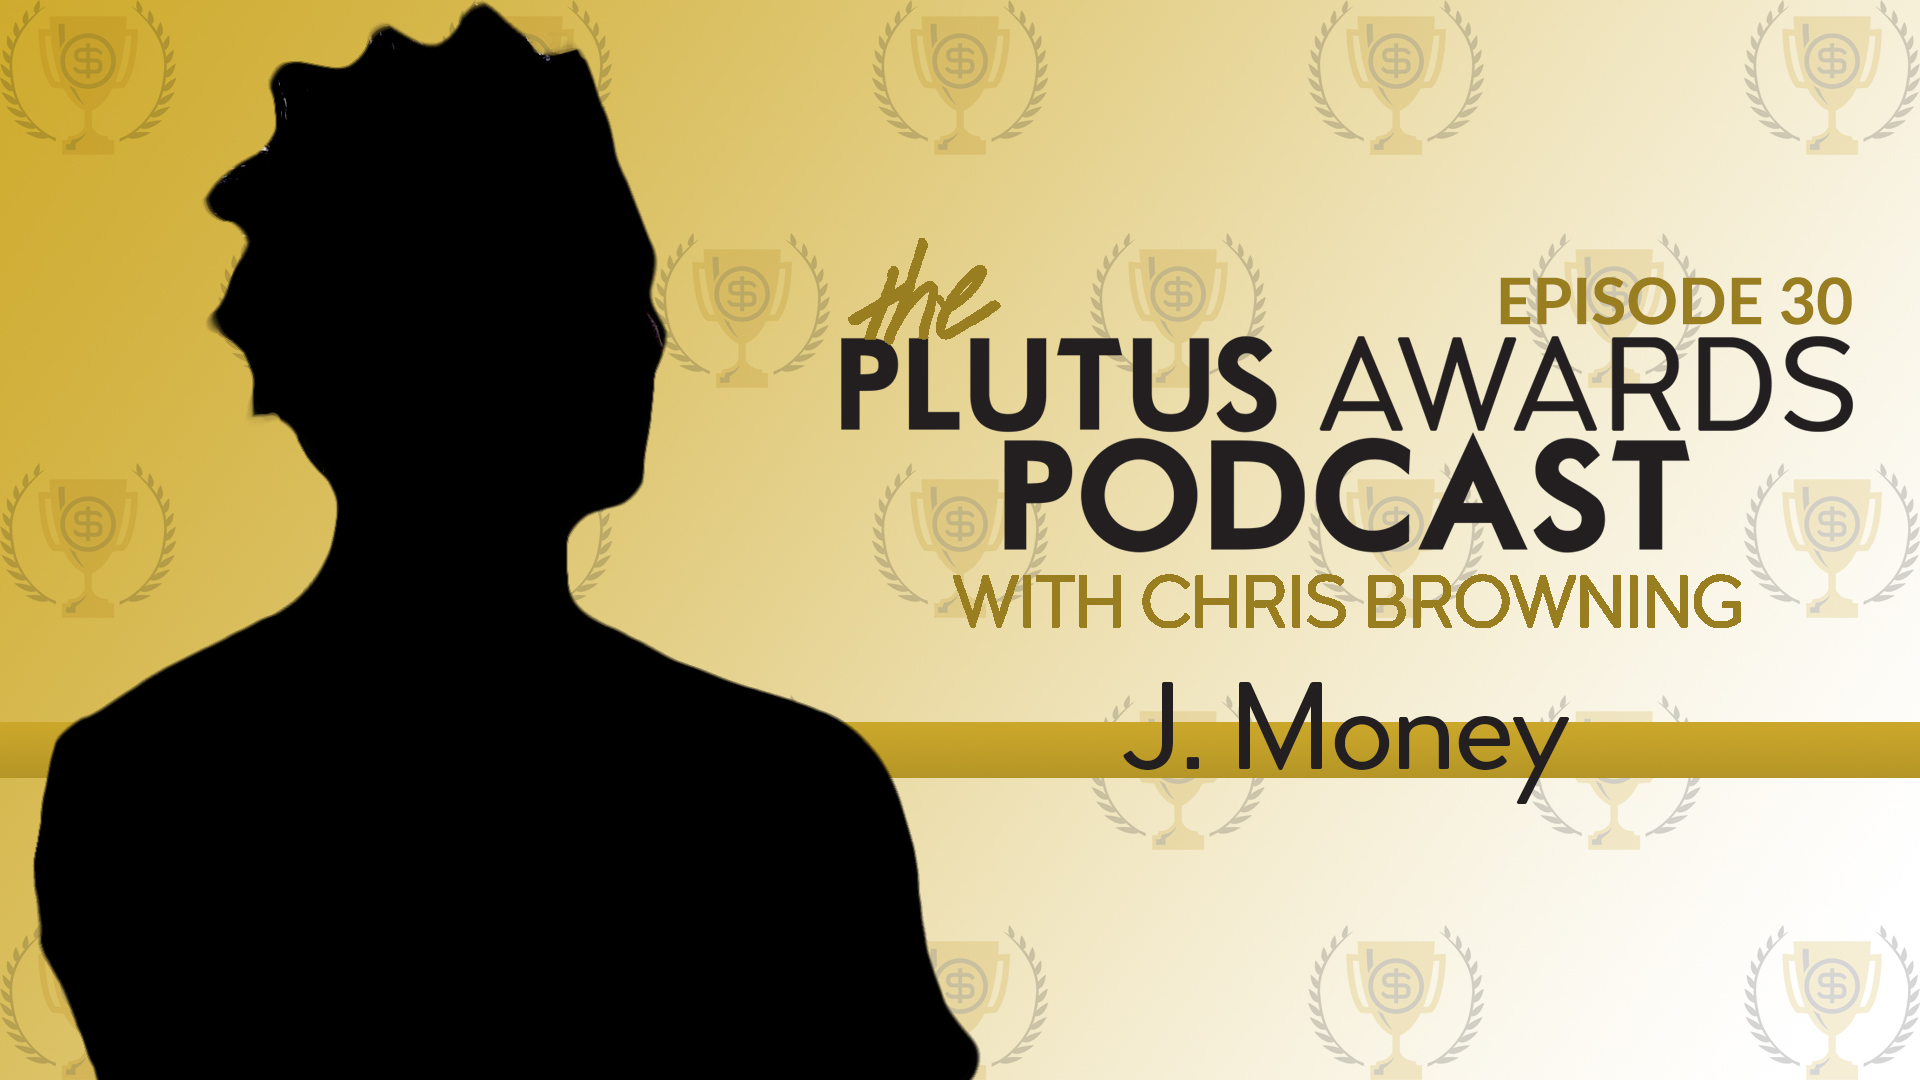 J. Money Plutus Awards Podcast Featured Image